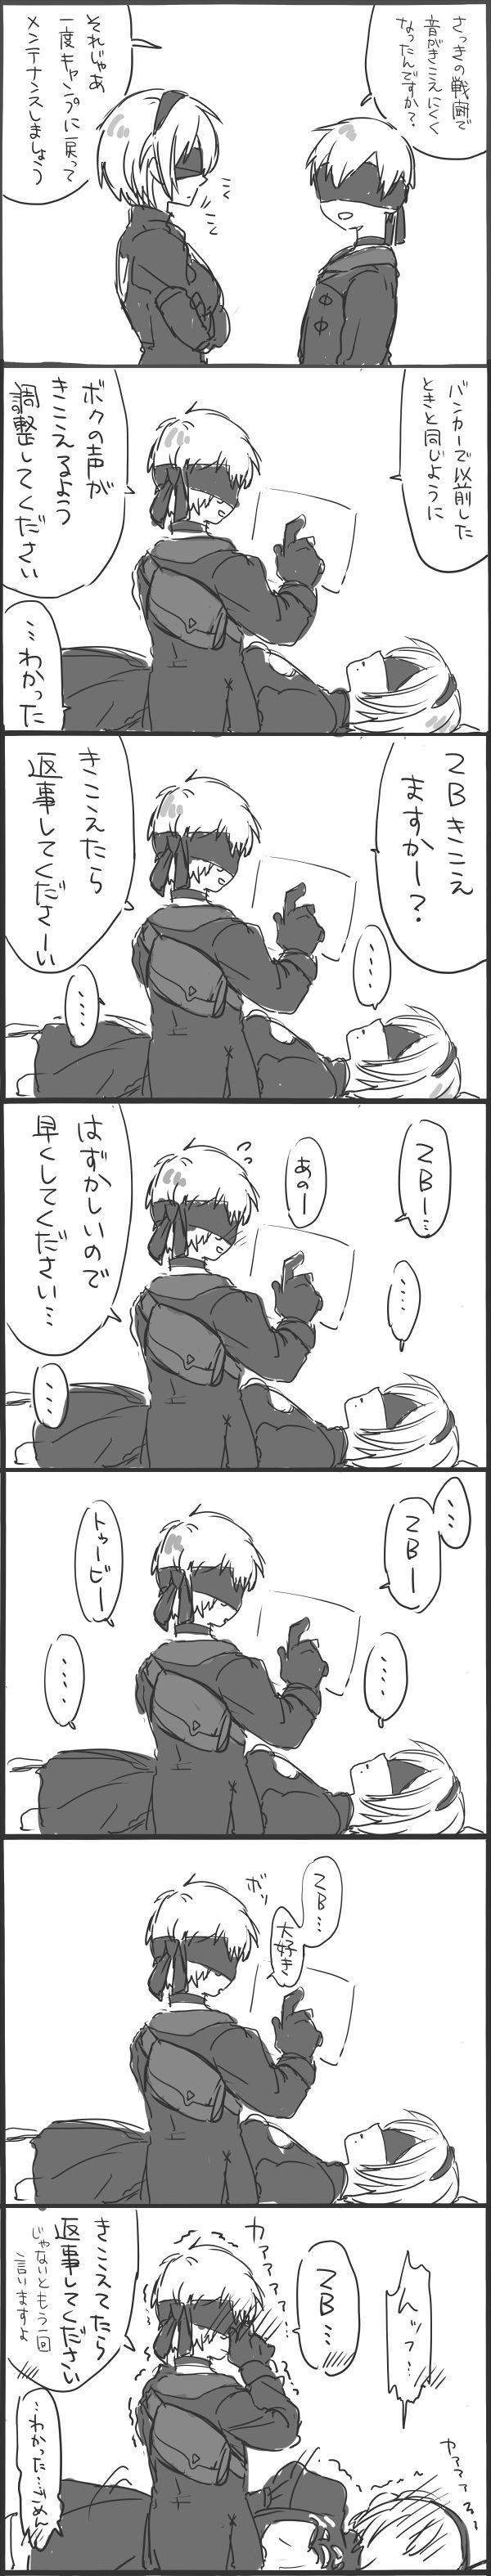 http://www.pixiv.net/member_illust.php?mode=manga_big